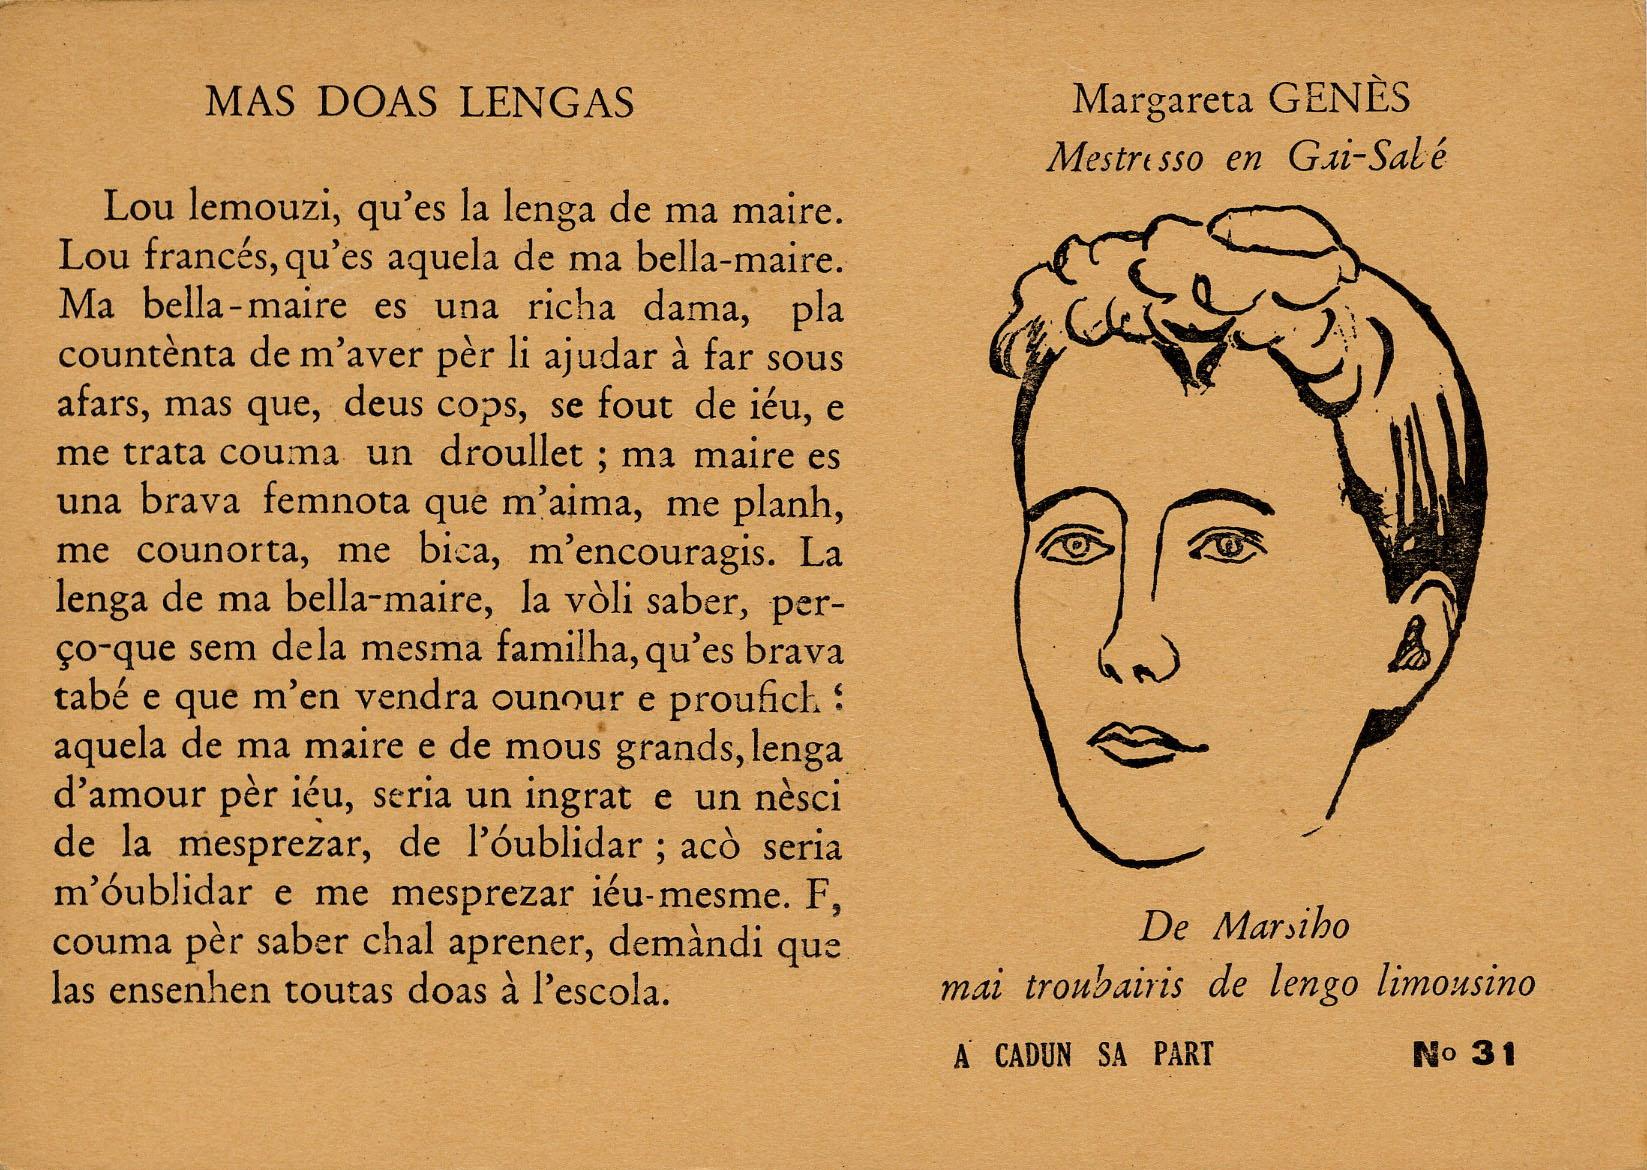 [Margareta Genès : Mestresso en Gai-Sabé], série de carte postale <i>A cadun sa part</i>, coll.CIRDÒC